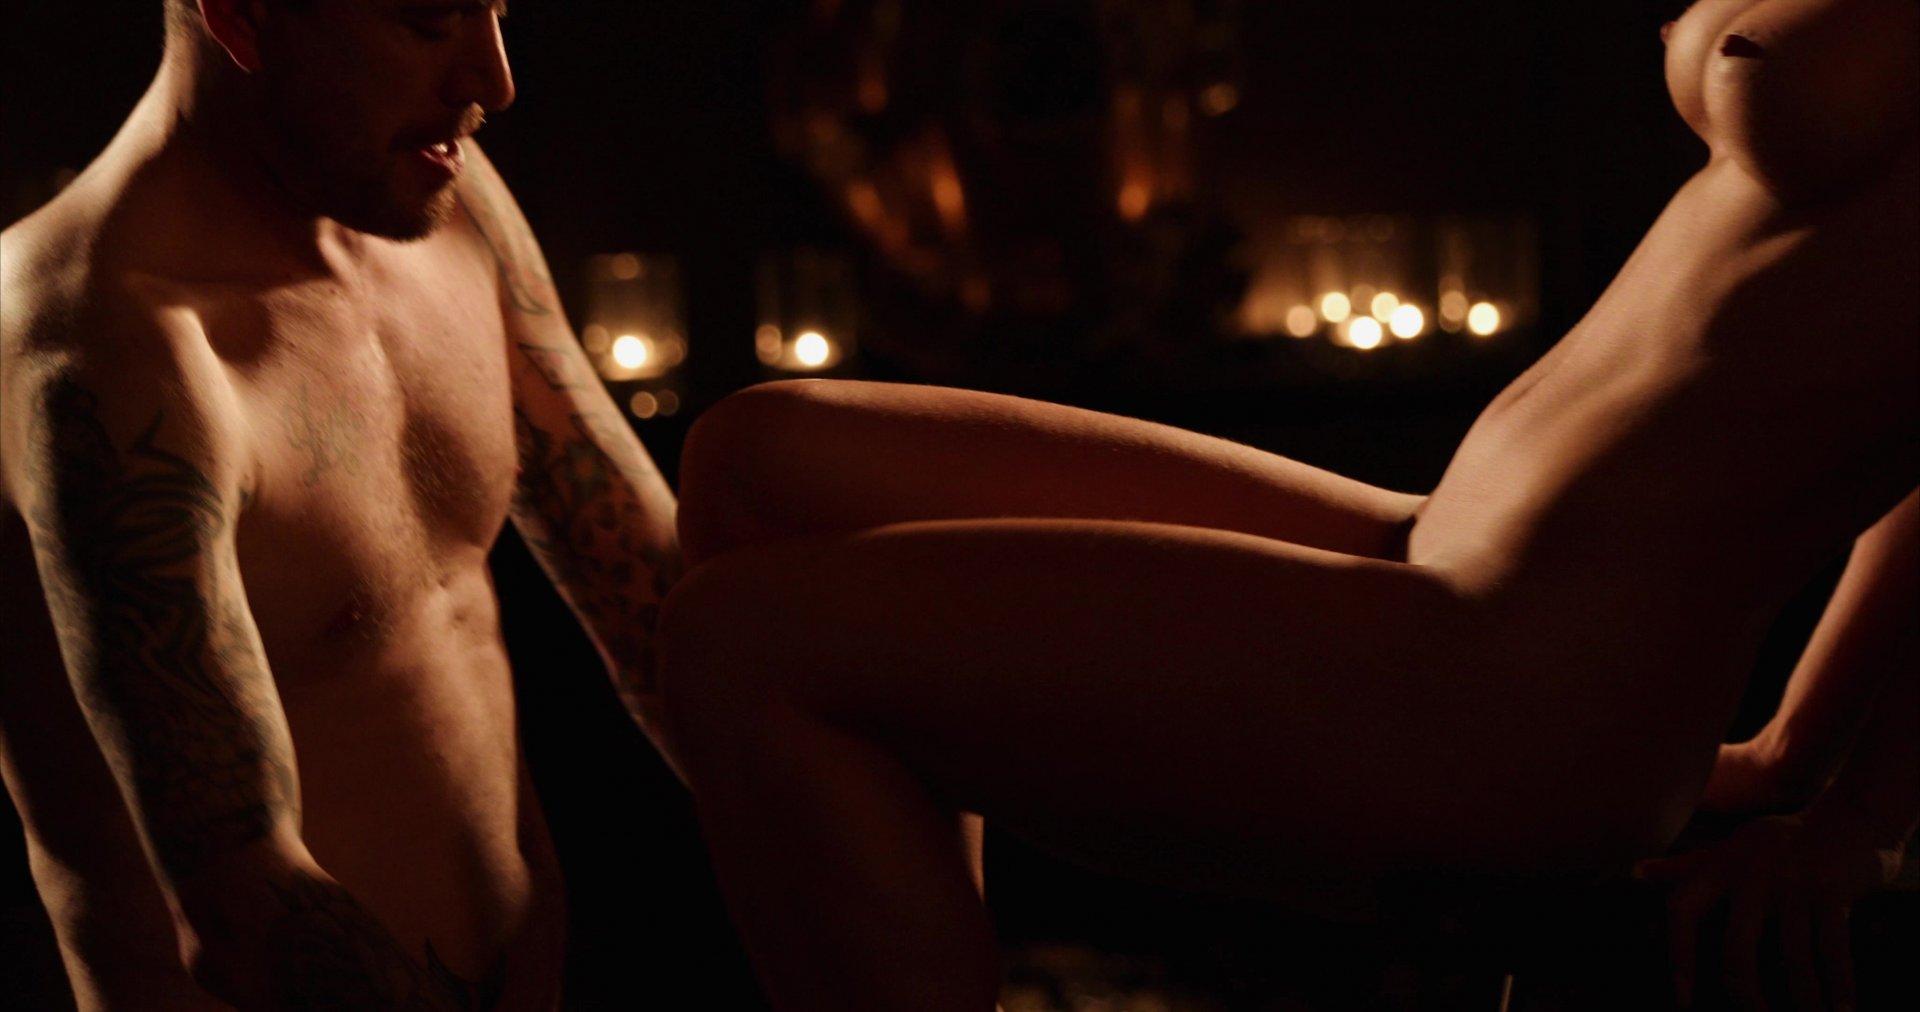 Hot Naughty Sexlive Nude Cams